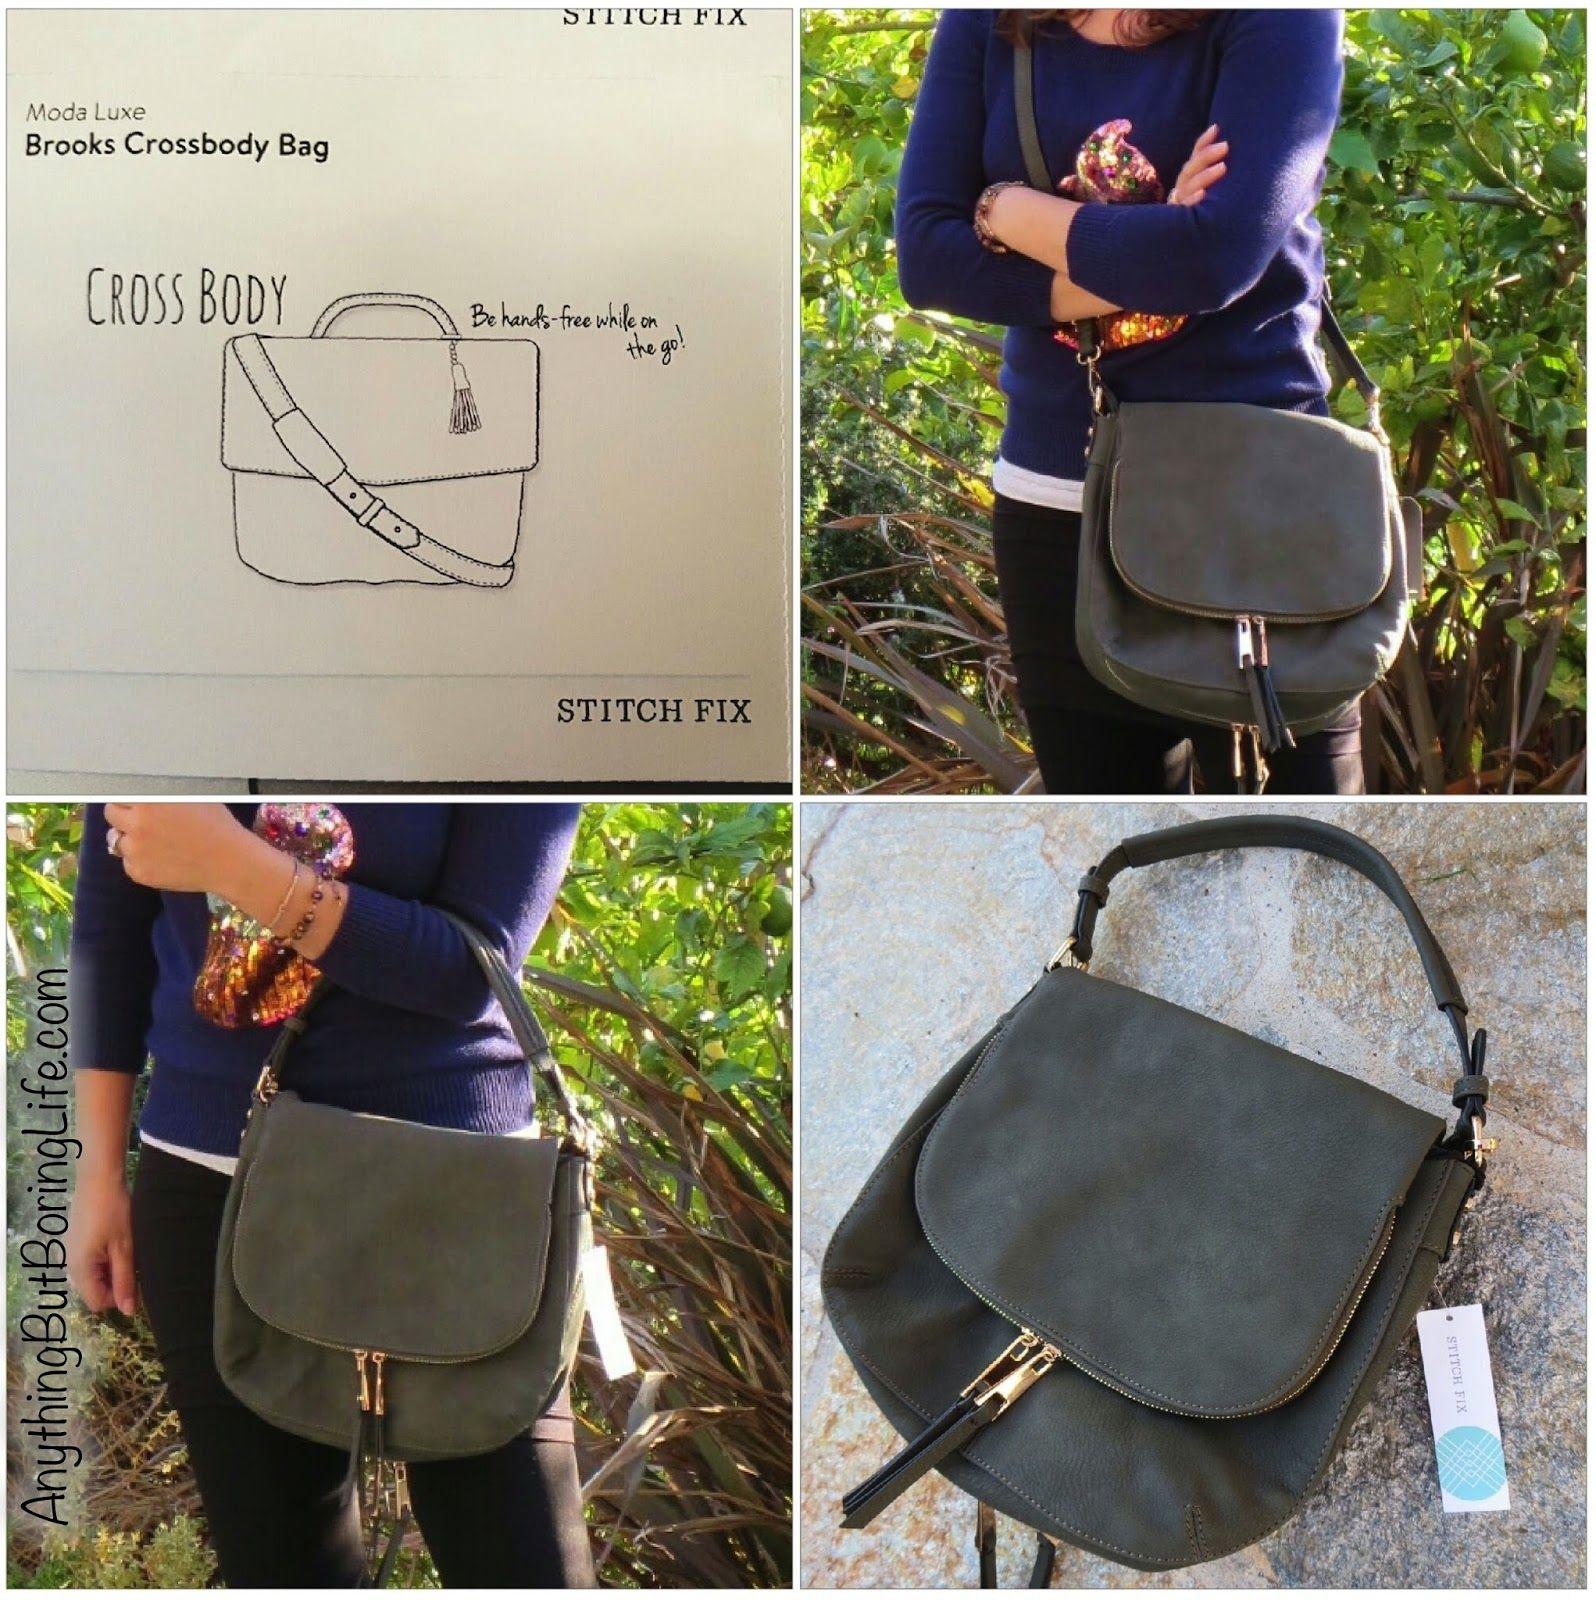 7f73172ff6 Moda Luxe Brooks Crossbody bag in olive, tan or black ---love this in  black!!!